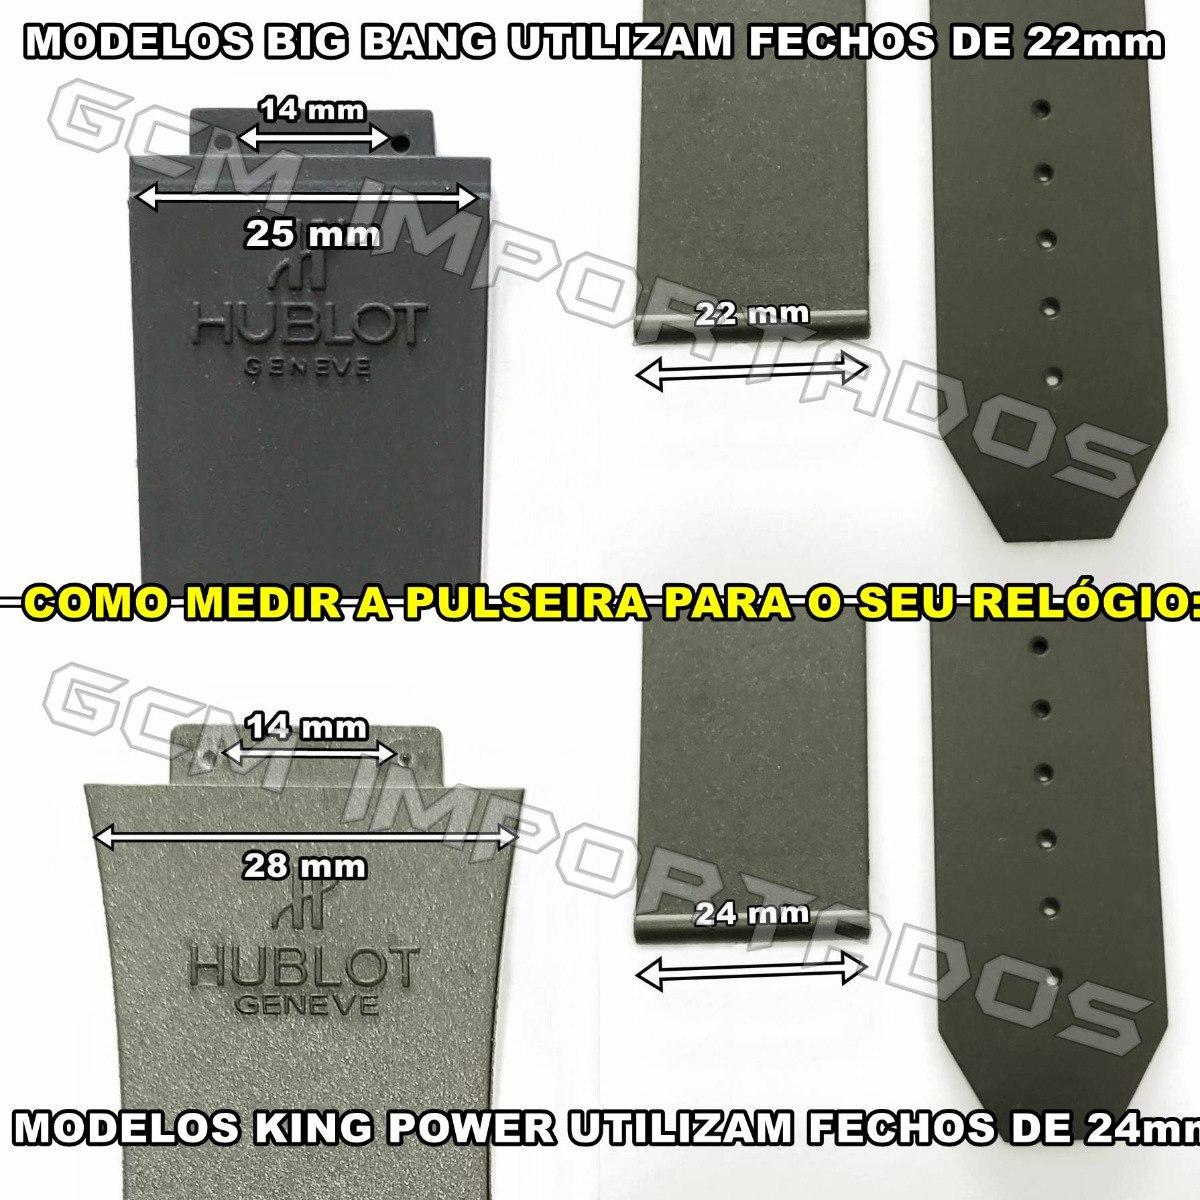 f6cdd9a4816 Pulseira Hublot King Power F1 Ayrton Senna Costura Amarela - R  59 ...